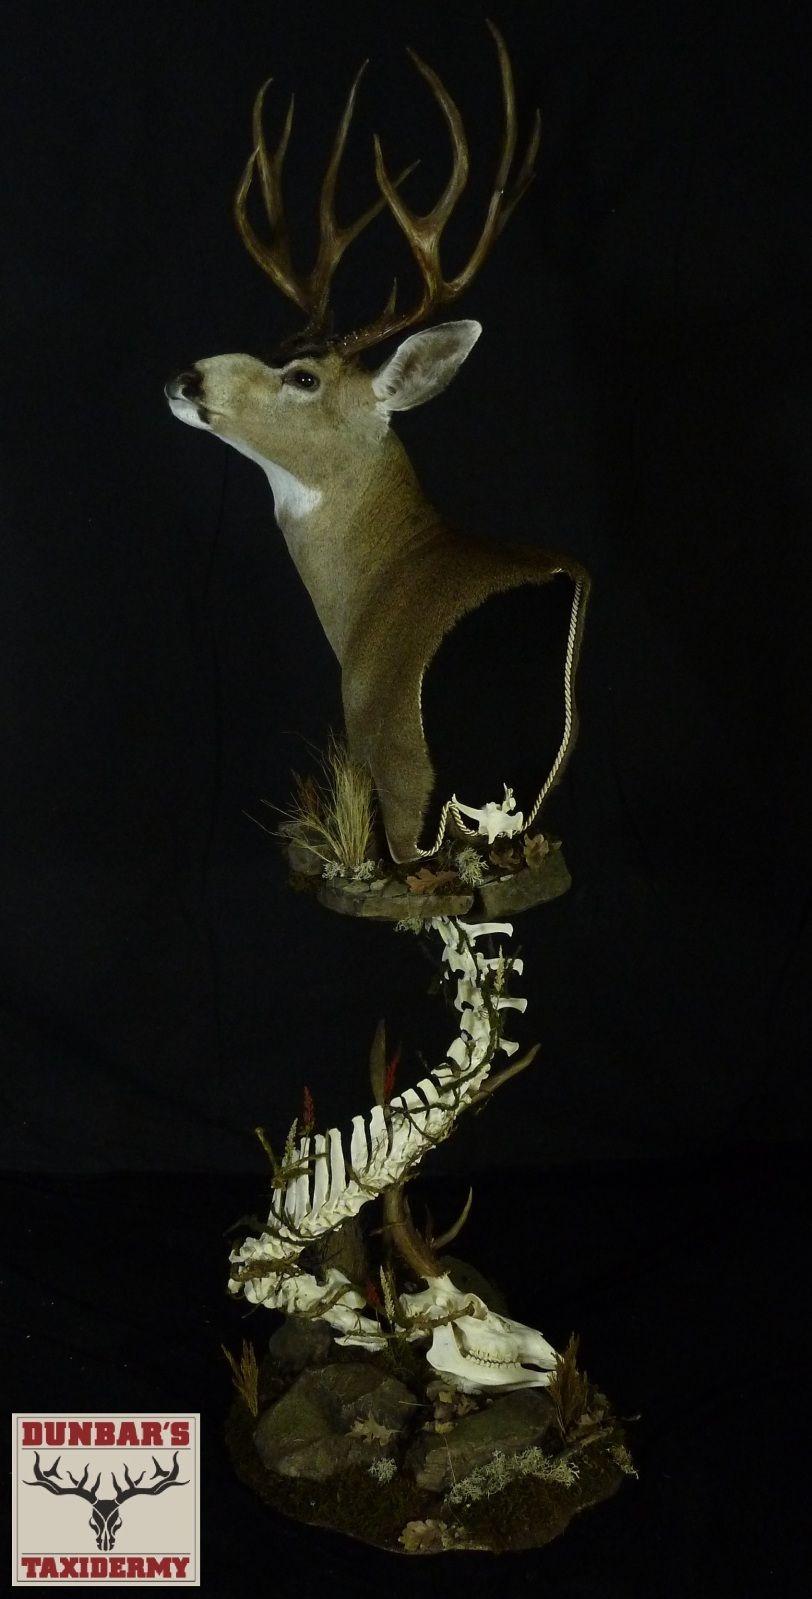 Pin by Tori WilkinsonLittle on Taxidermy Taxidermy art